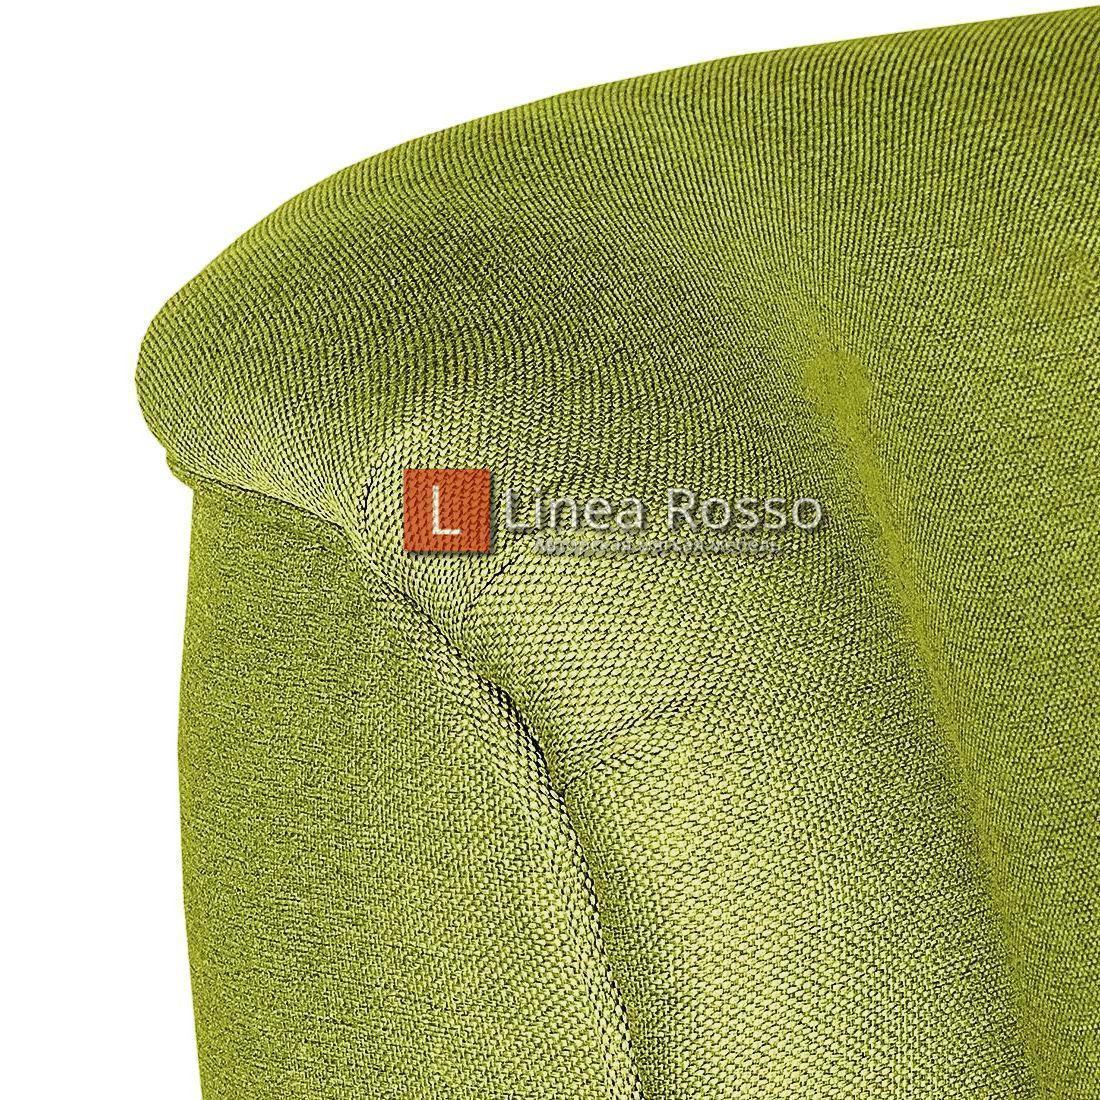 salatovoe kreslo10 - Кресло в салатовом цвете на заказ